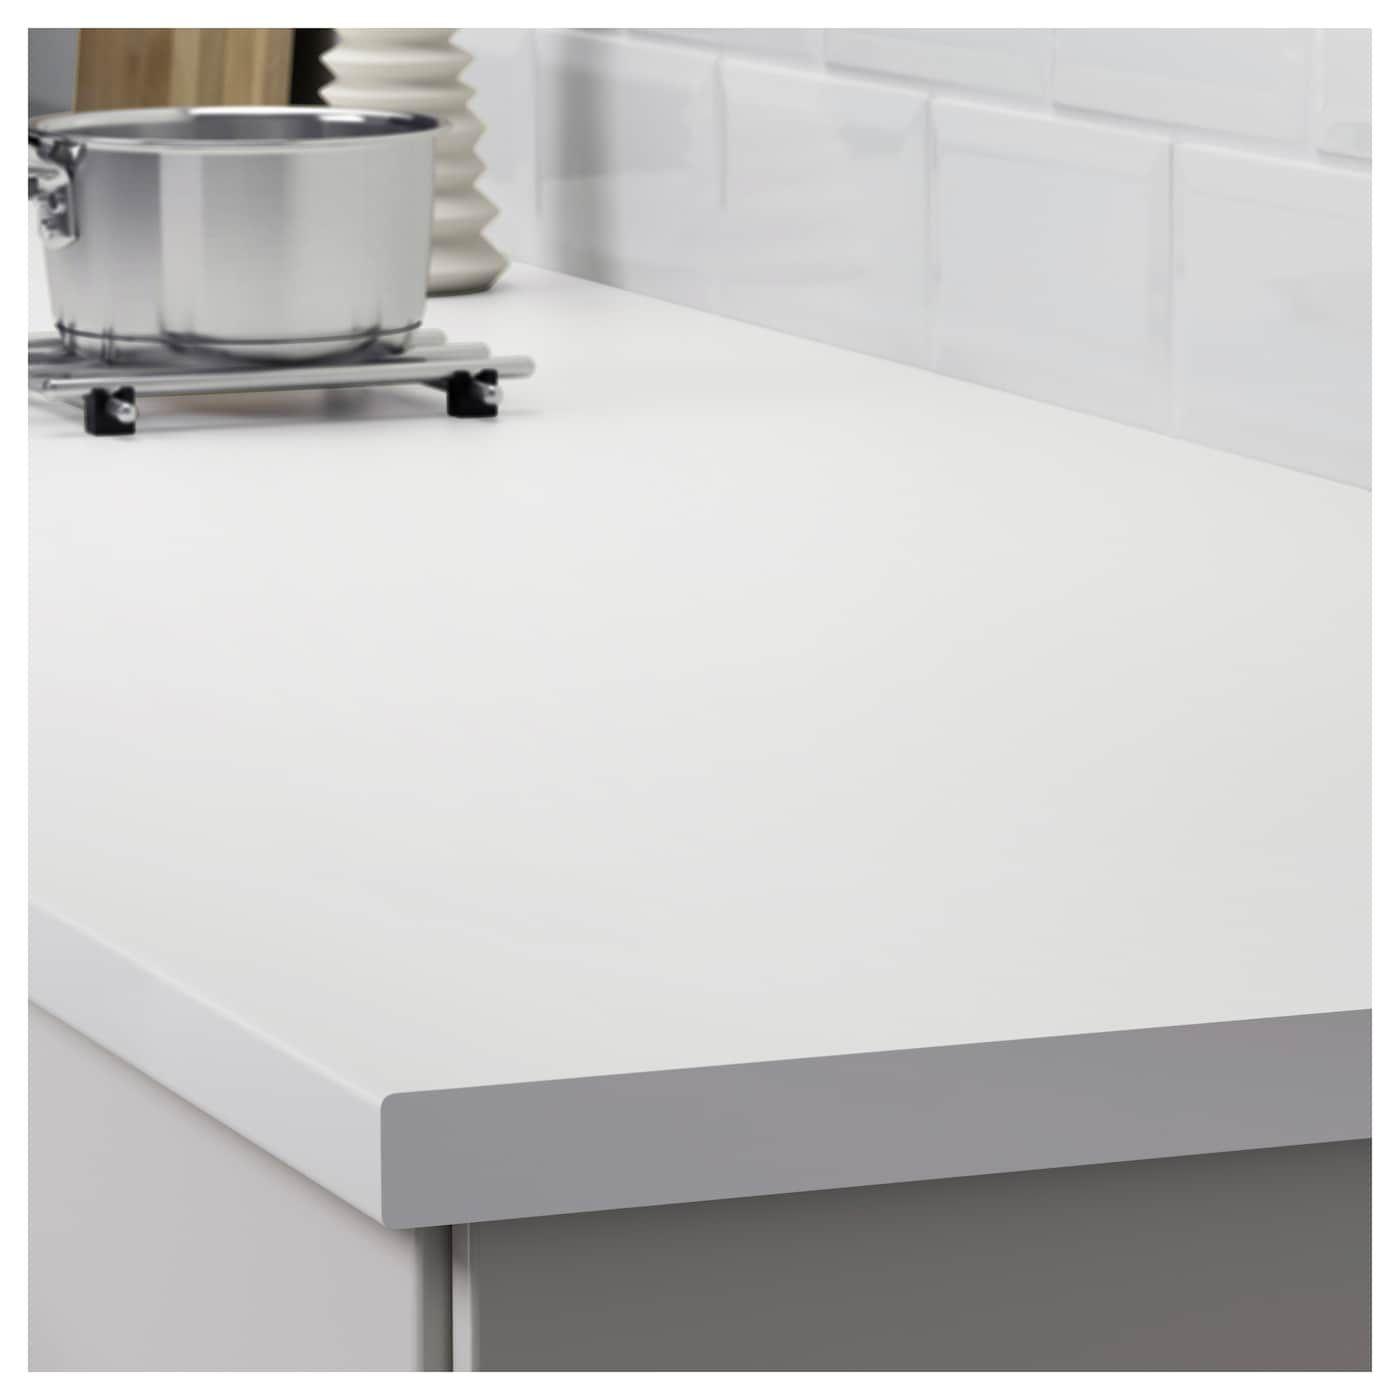 Lilltrask Bordplade Hvid Laminat 186x2 8 Cm Ikea White Laminate Countertops Laminate Countertops Countertops